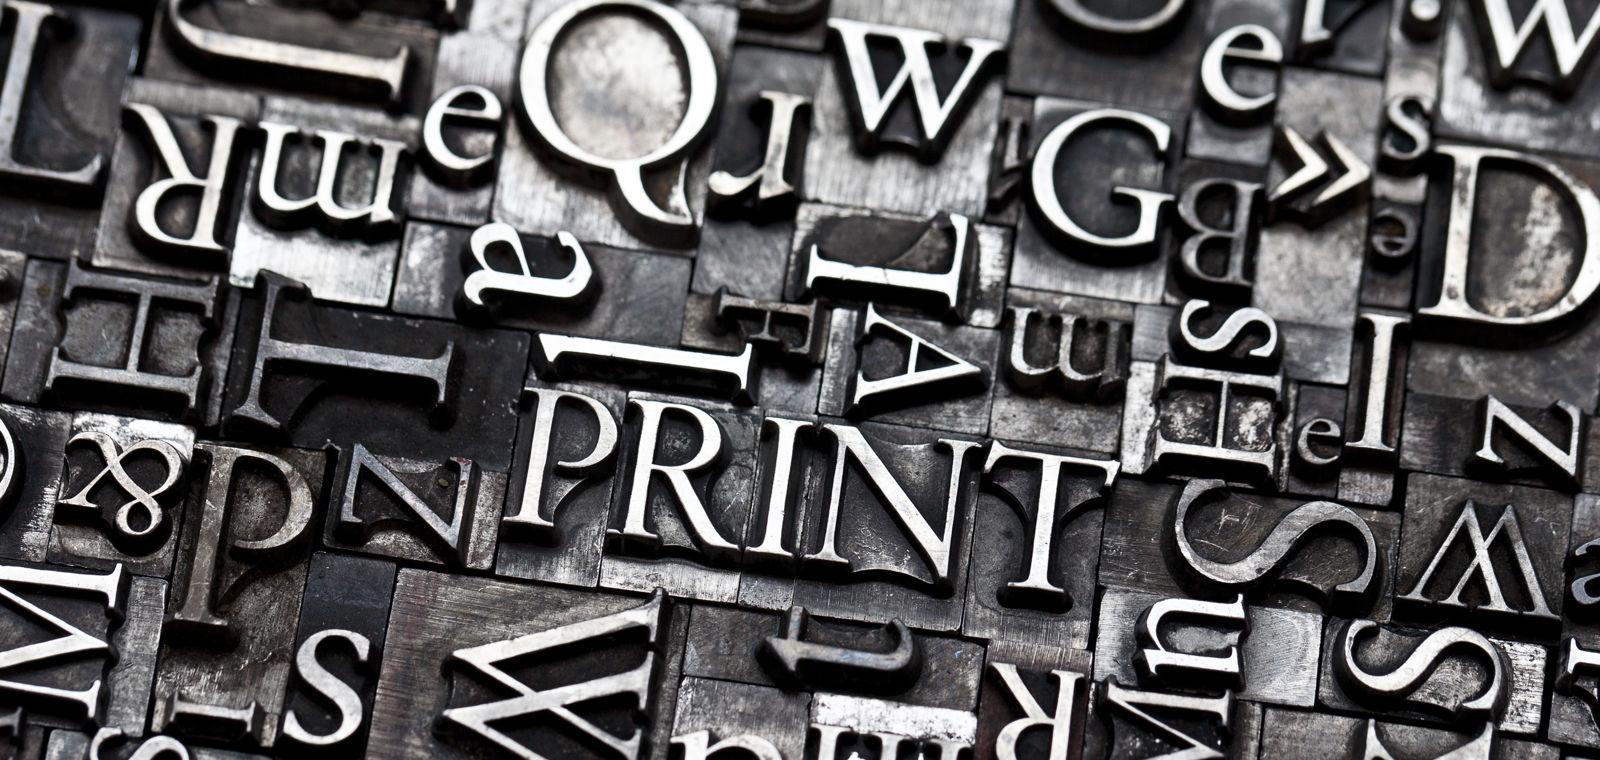 Metal Press Letters